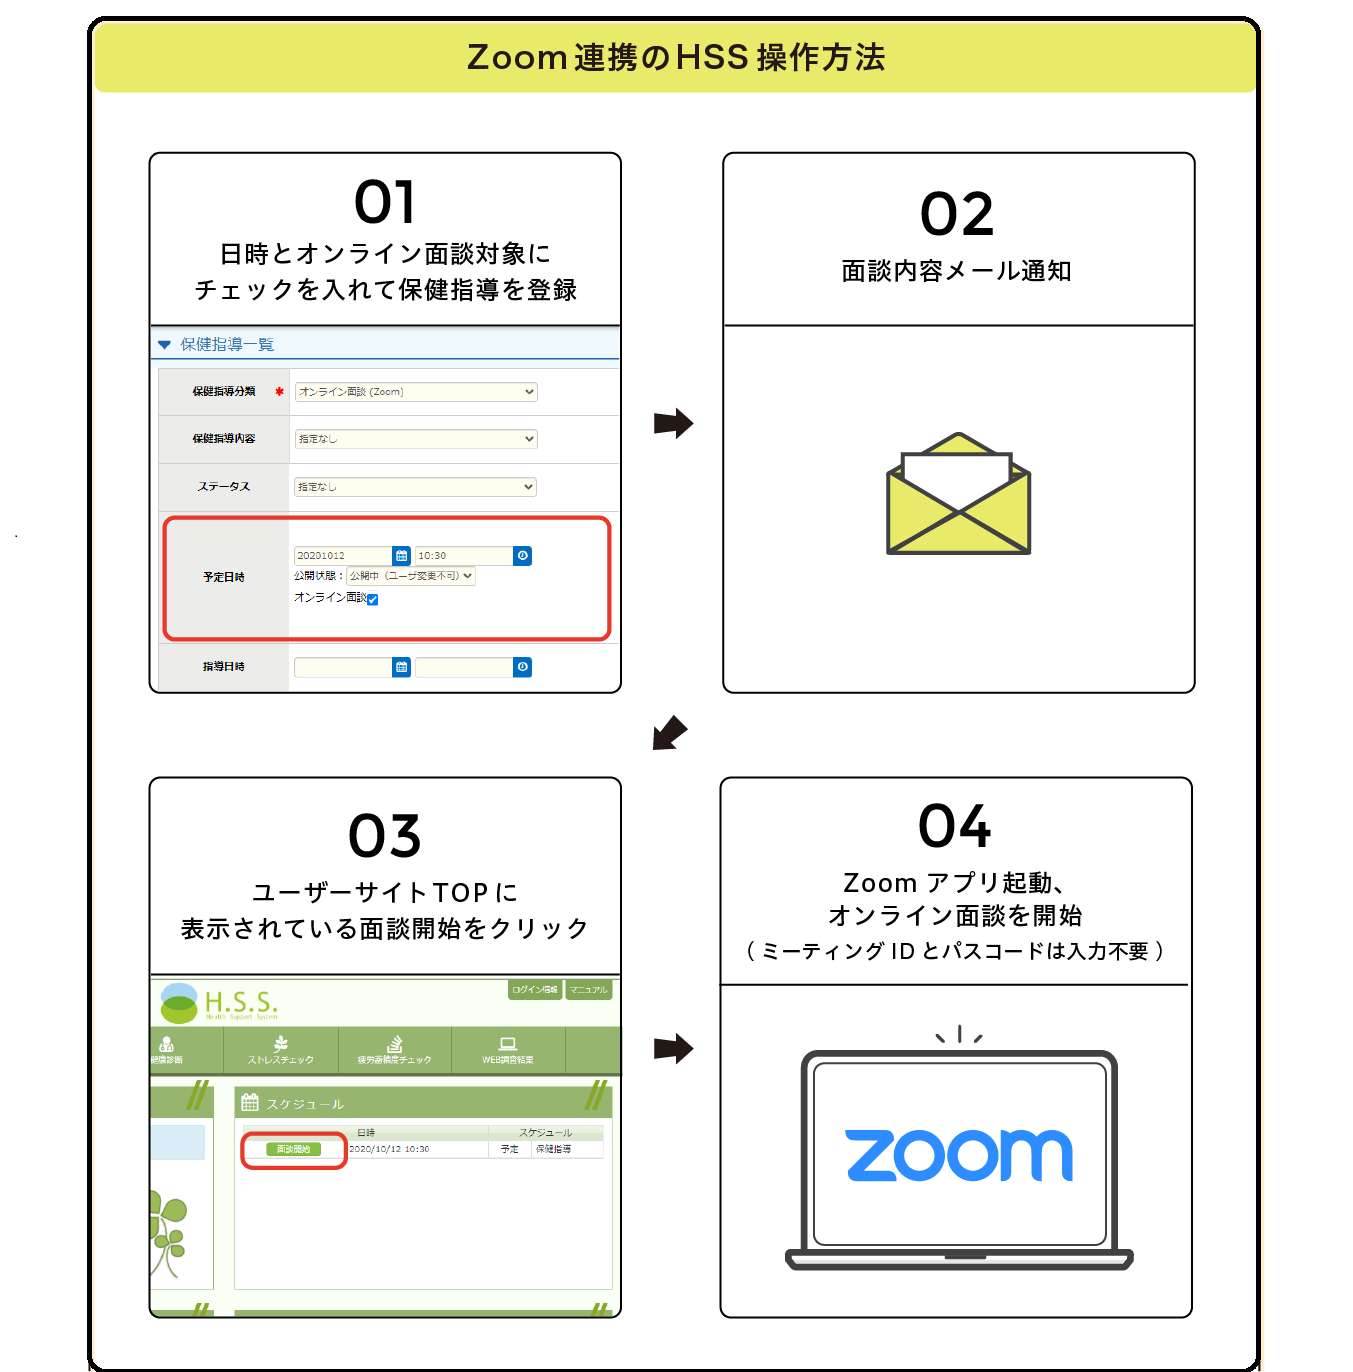 04_wellness_zoom_operation-1